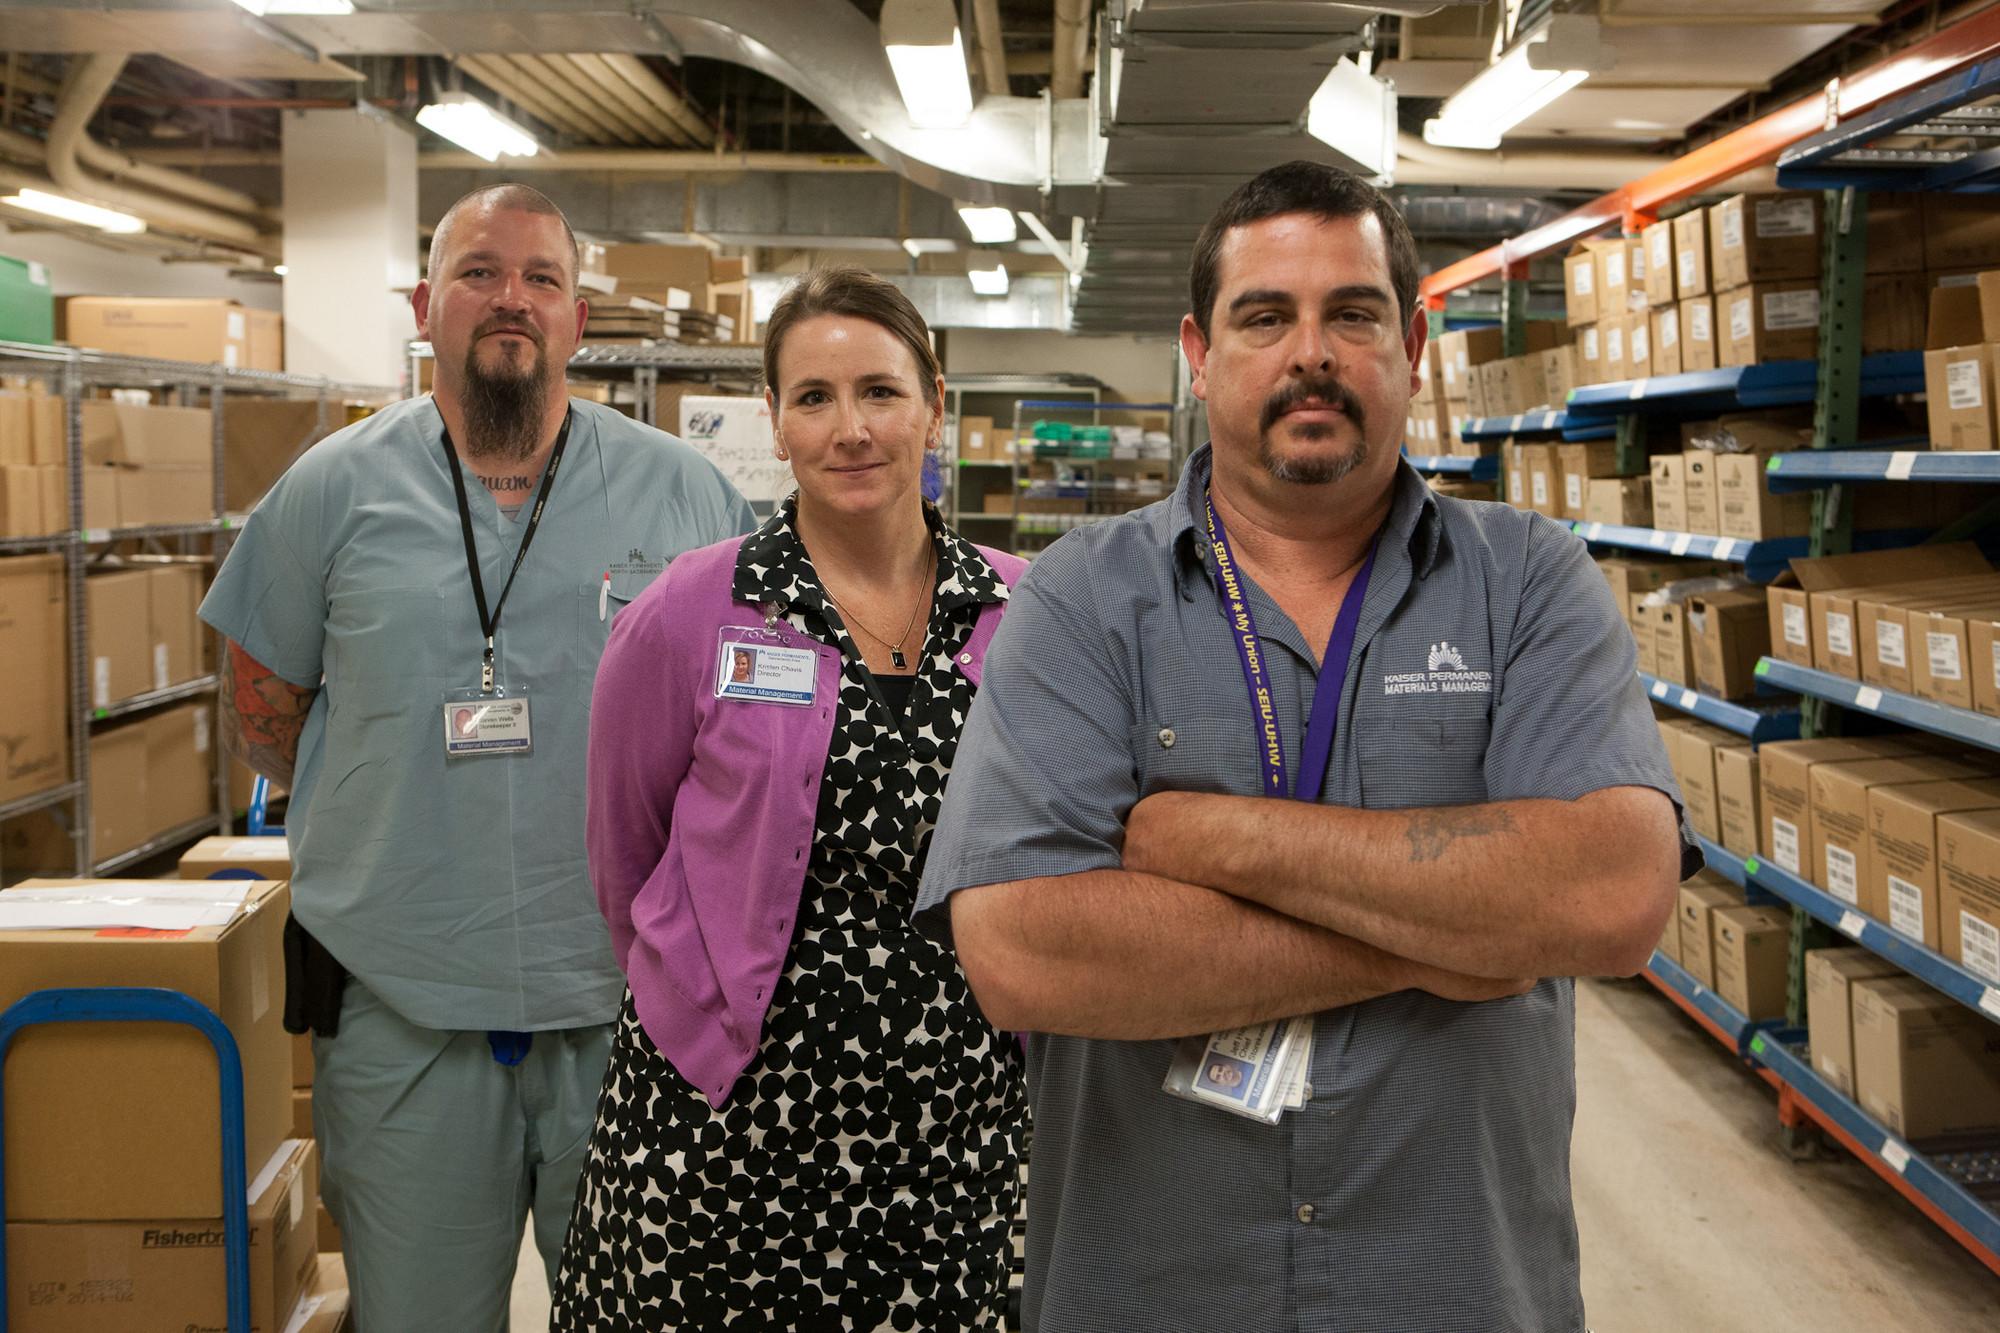 Material Management. L-R) Storekeeper 2 Steve Wells. UHW; Director Kristen Chavis. Management; and Chief Storekeeper Jeff Hayes. UHW